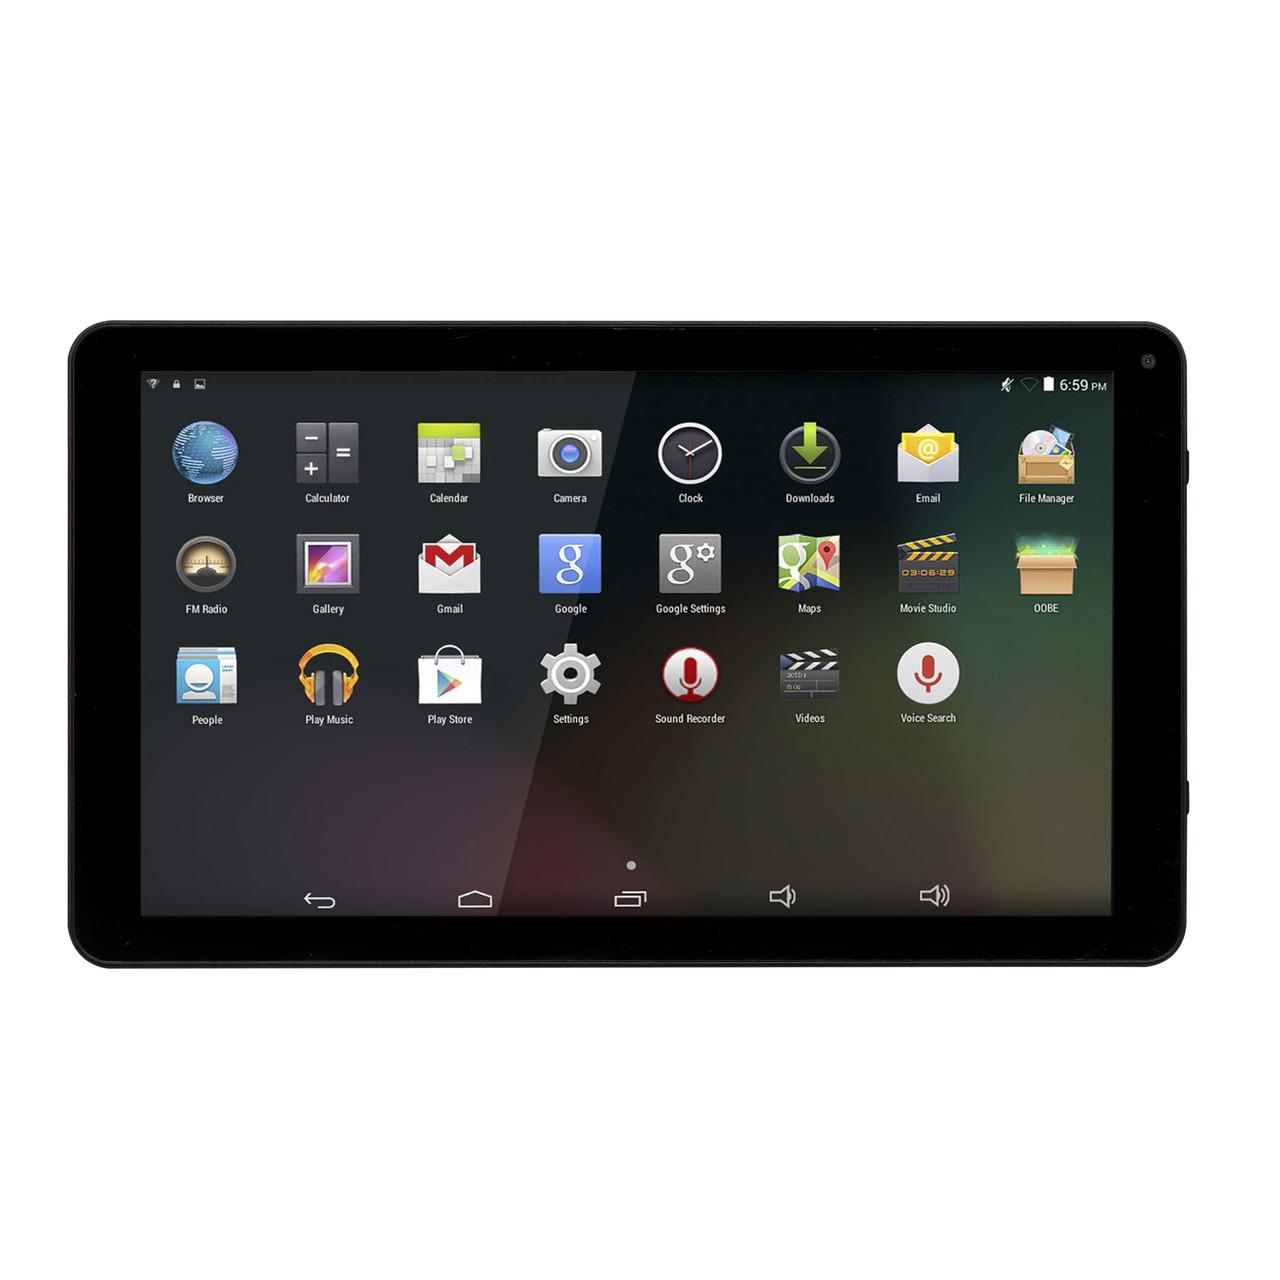 Denver Tablet TAQ-10283- 25-65-cm-Display (10-1)- 1024x600p- 1-2 GHz Quad-Core CPU- Android 8-1